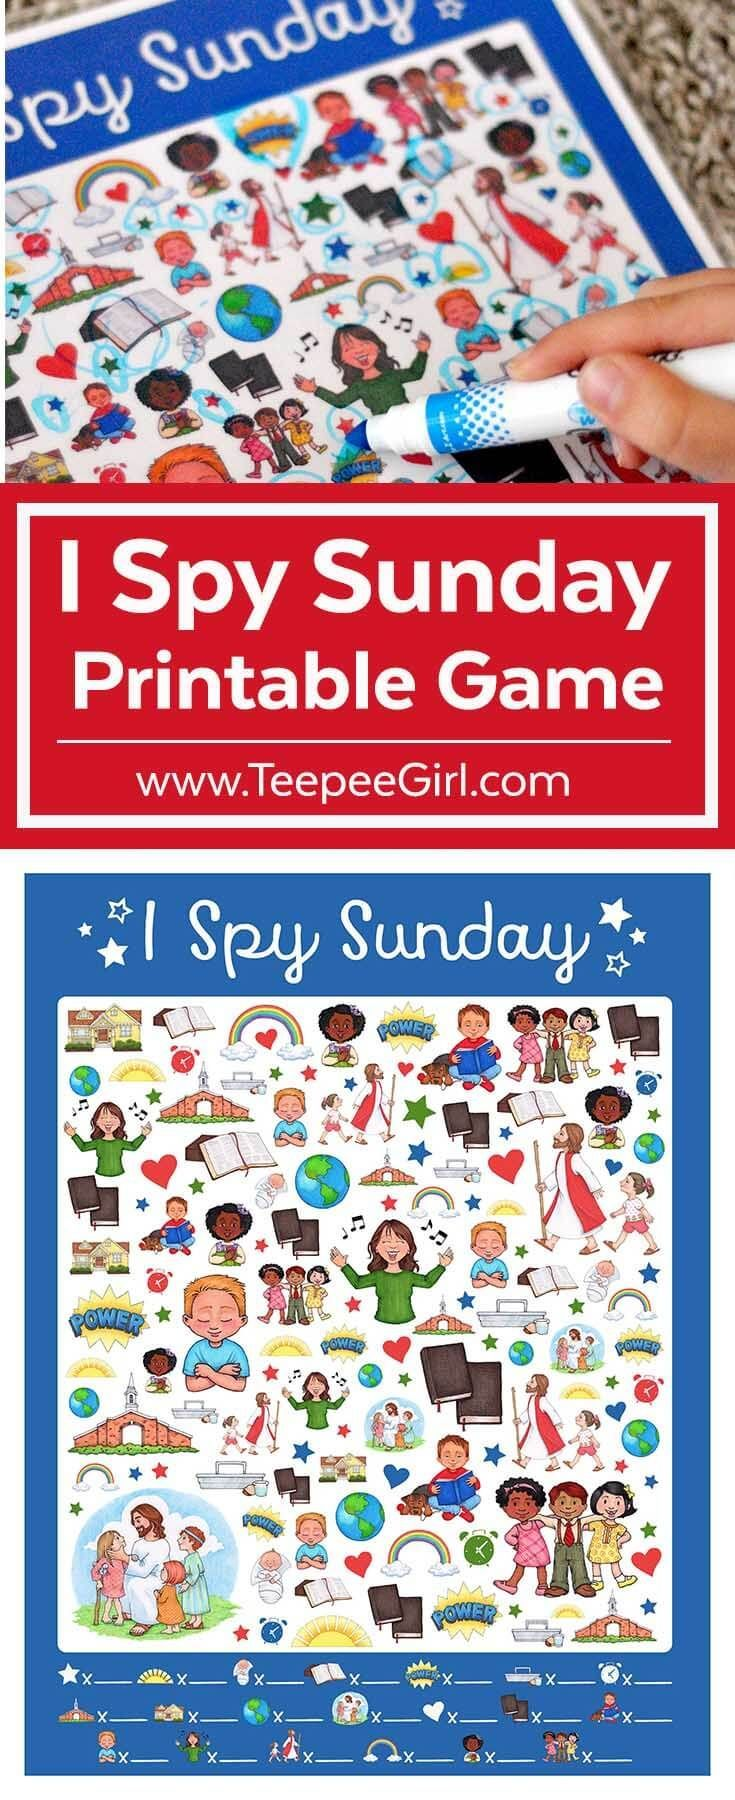 Free I Spy Sunday Printable Game Sunday school